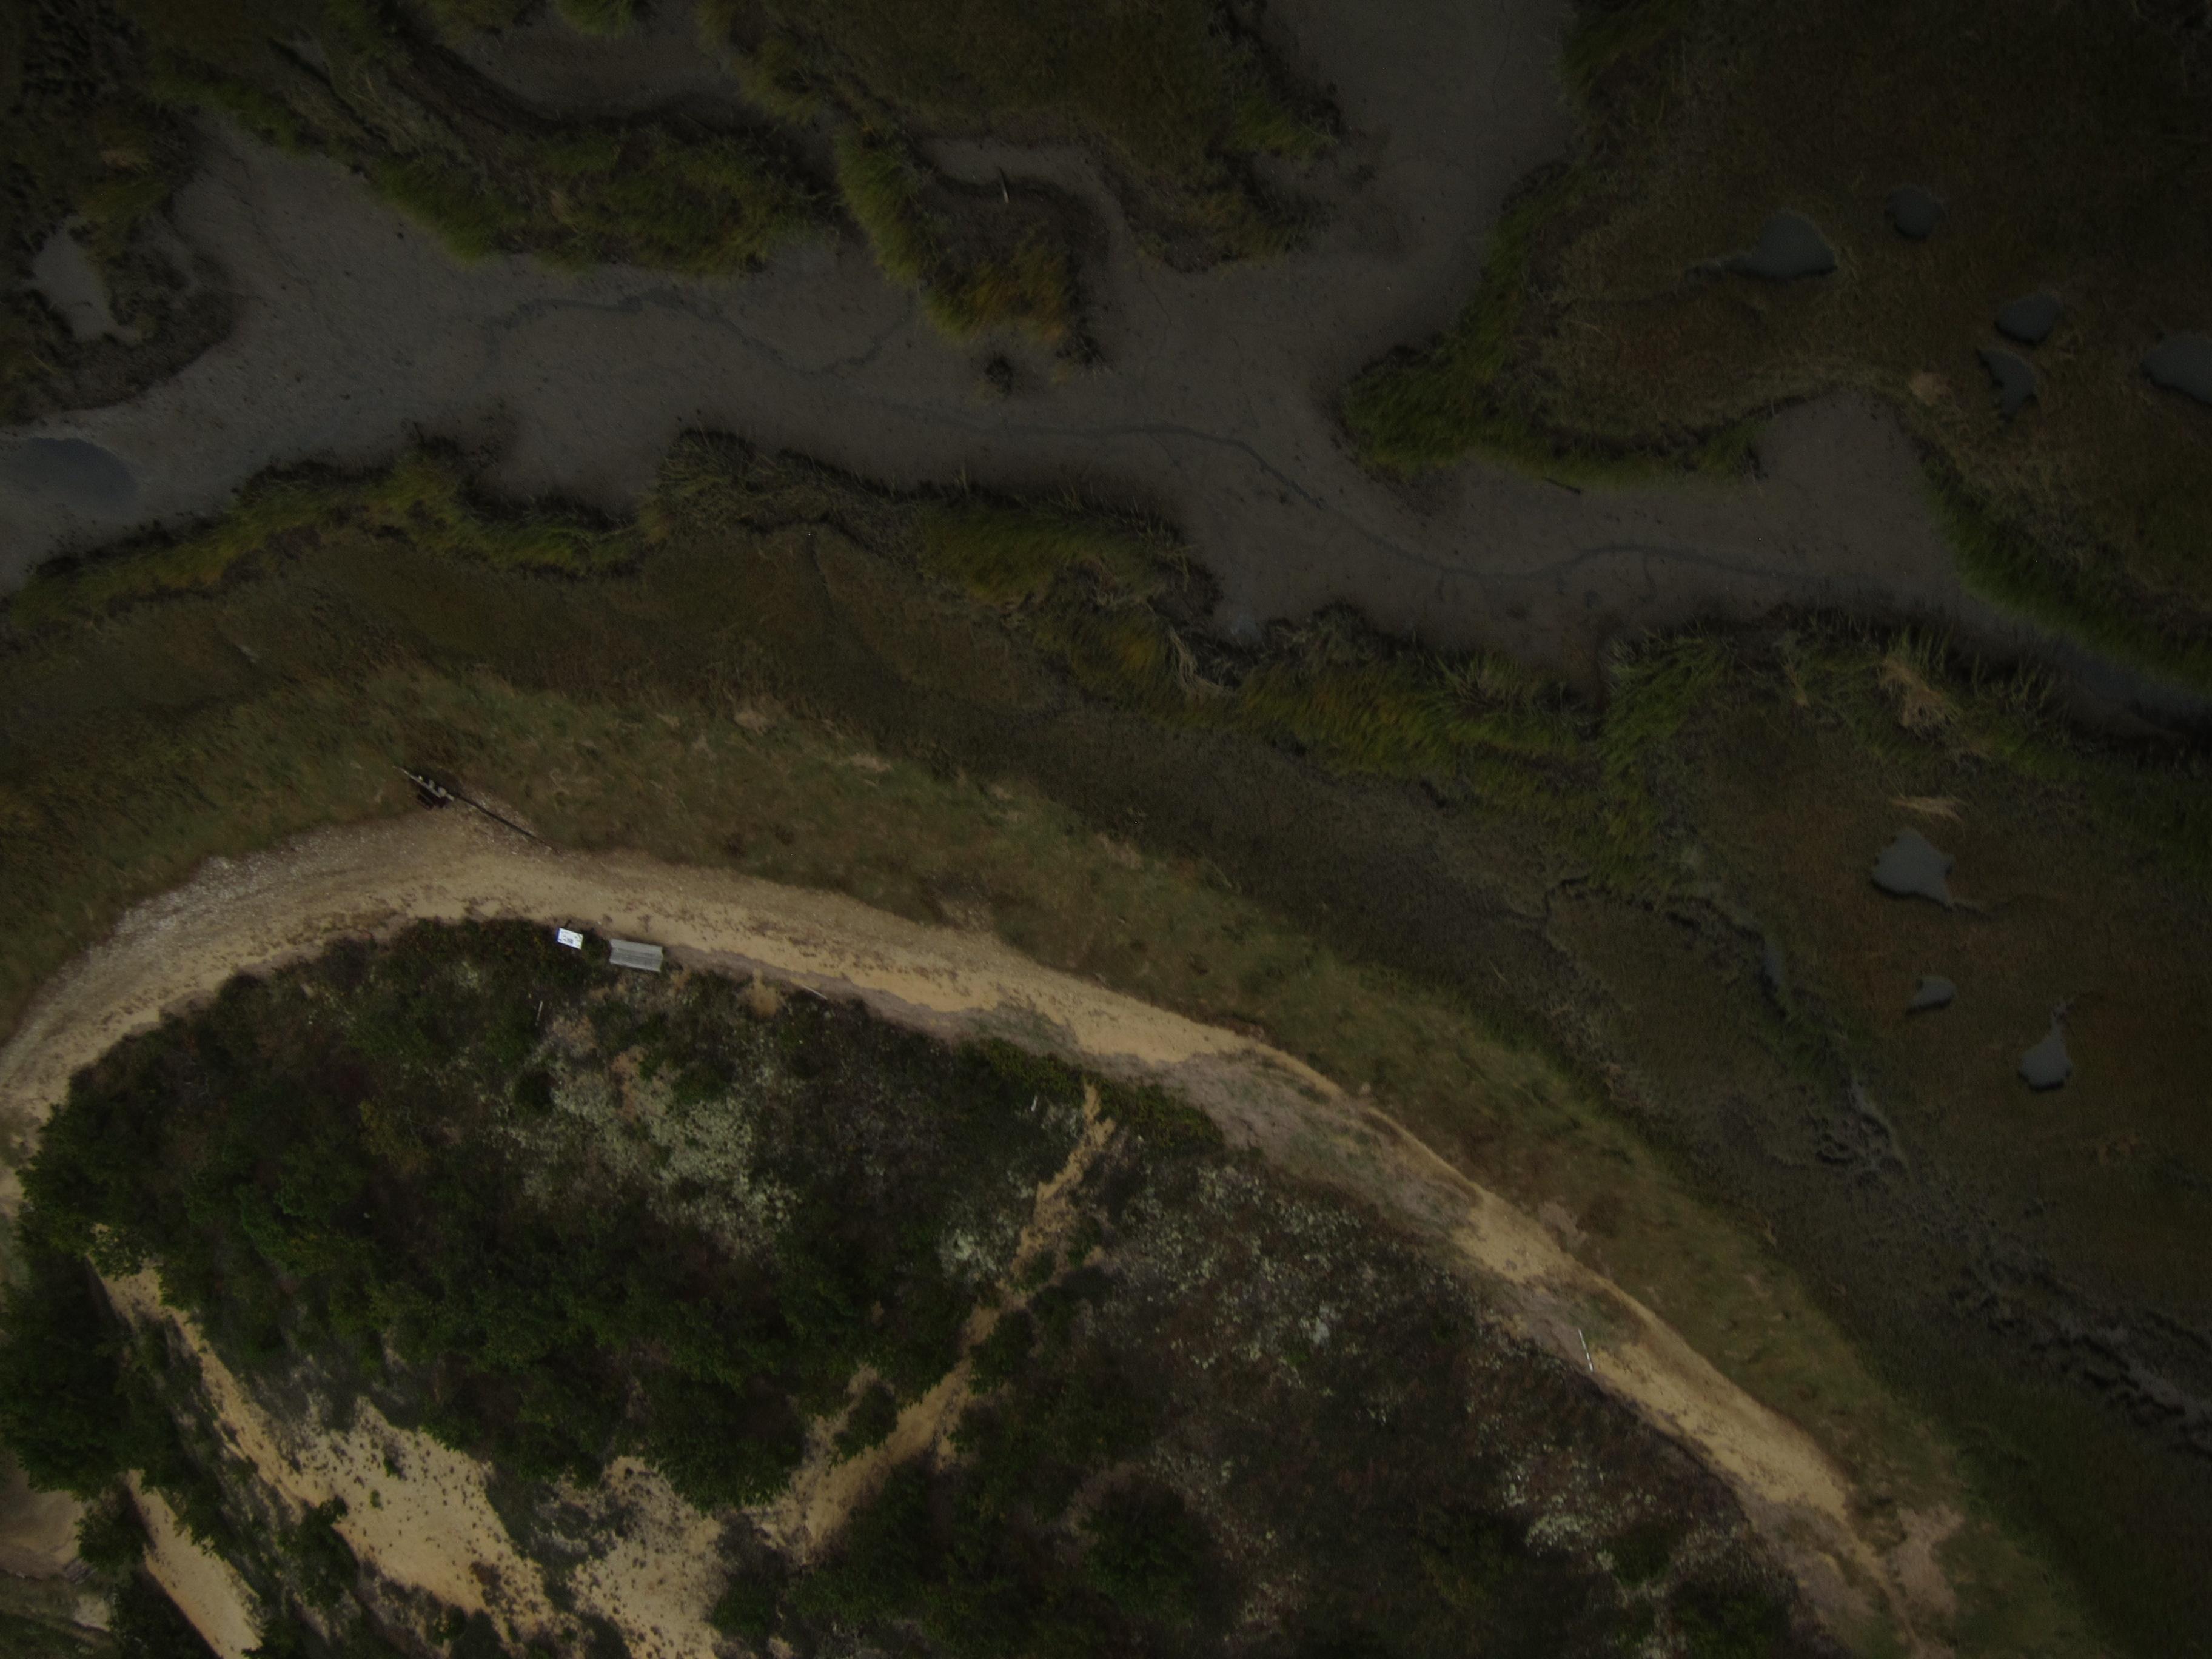 20131013-phats-valley-cartography-primer